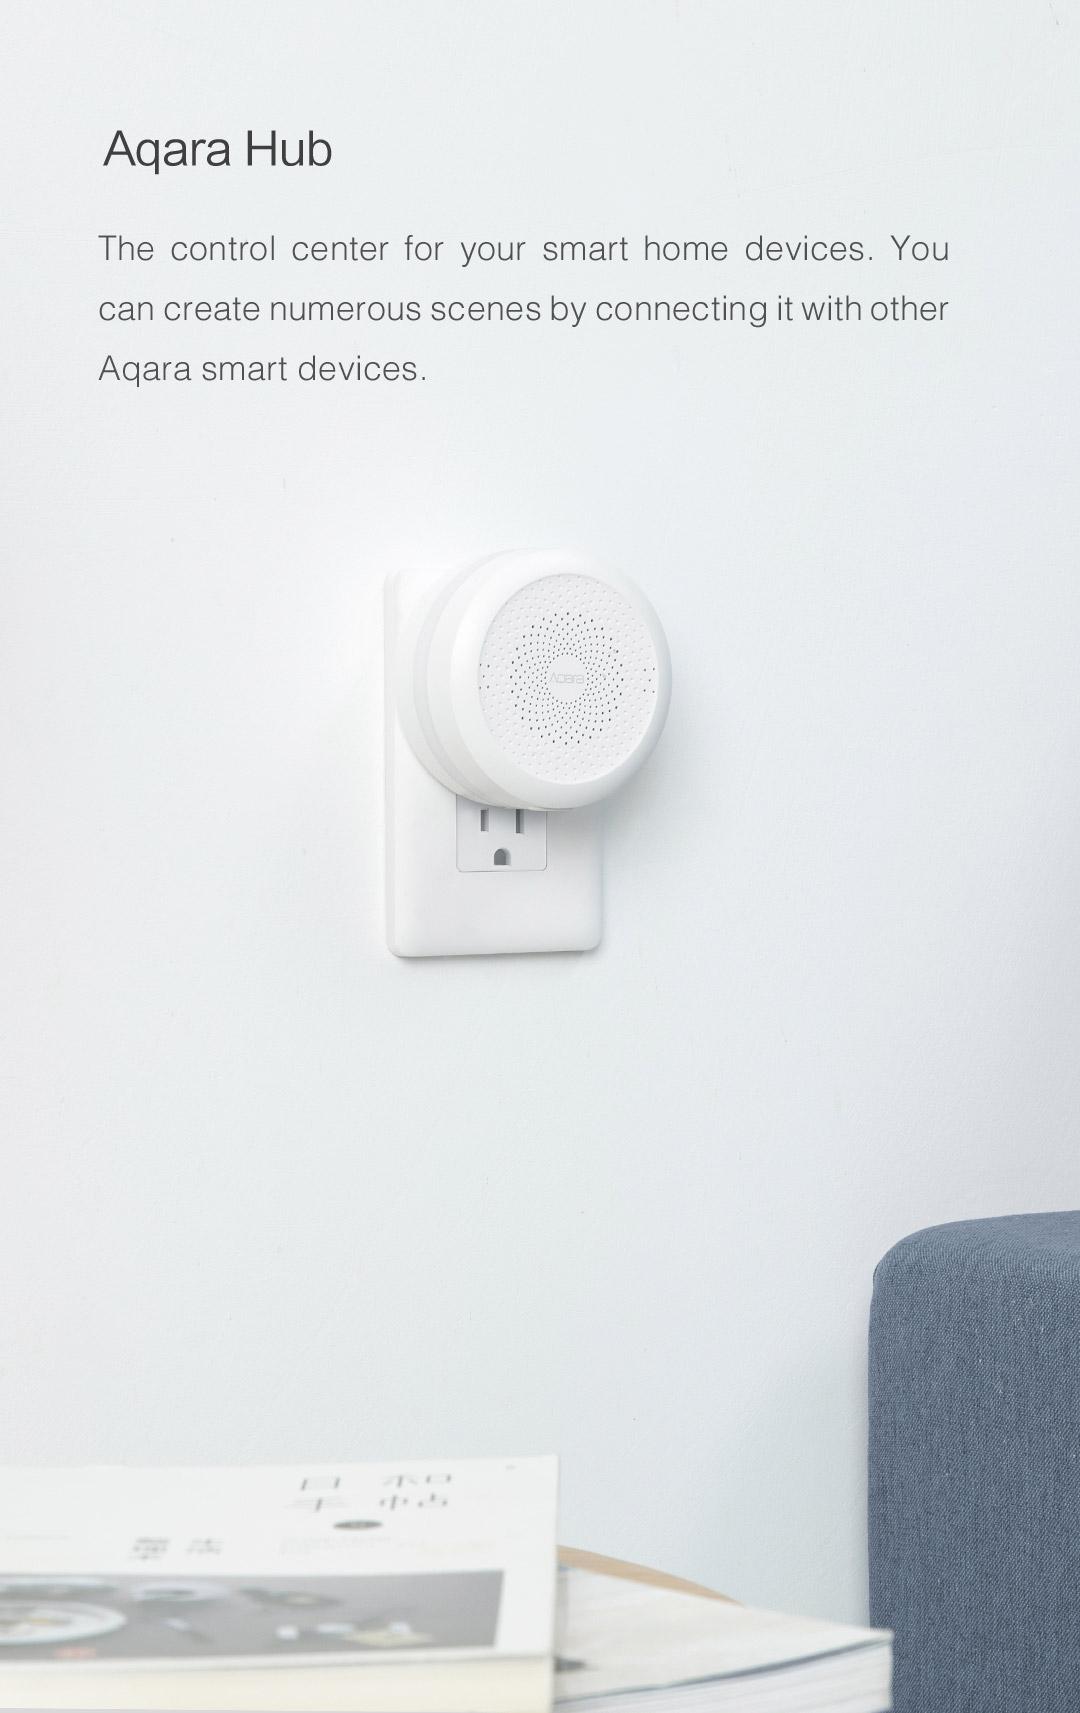 Aqara smart home kit's control center - Aqara Hub